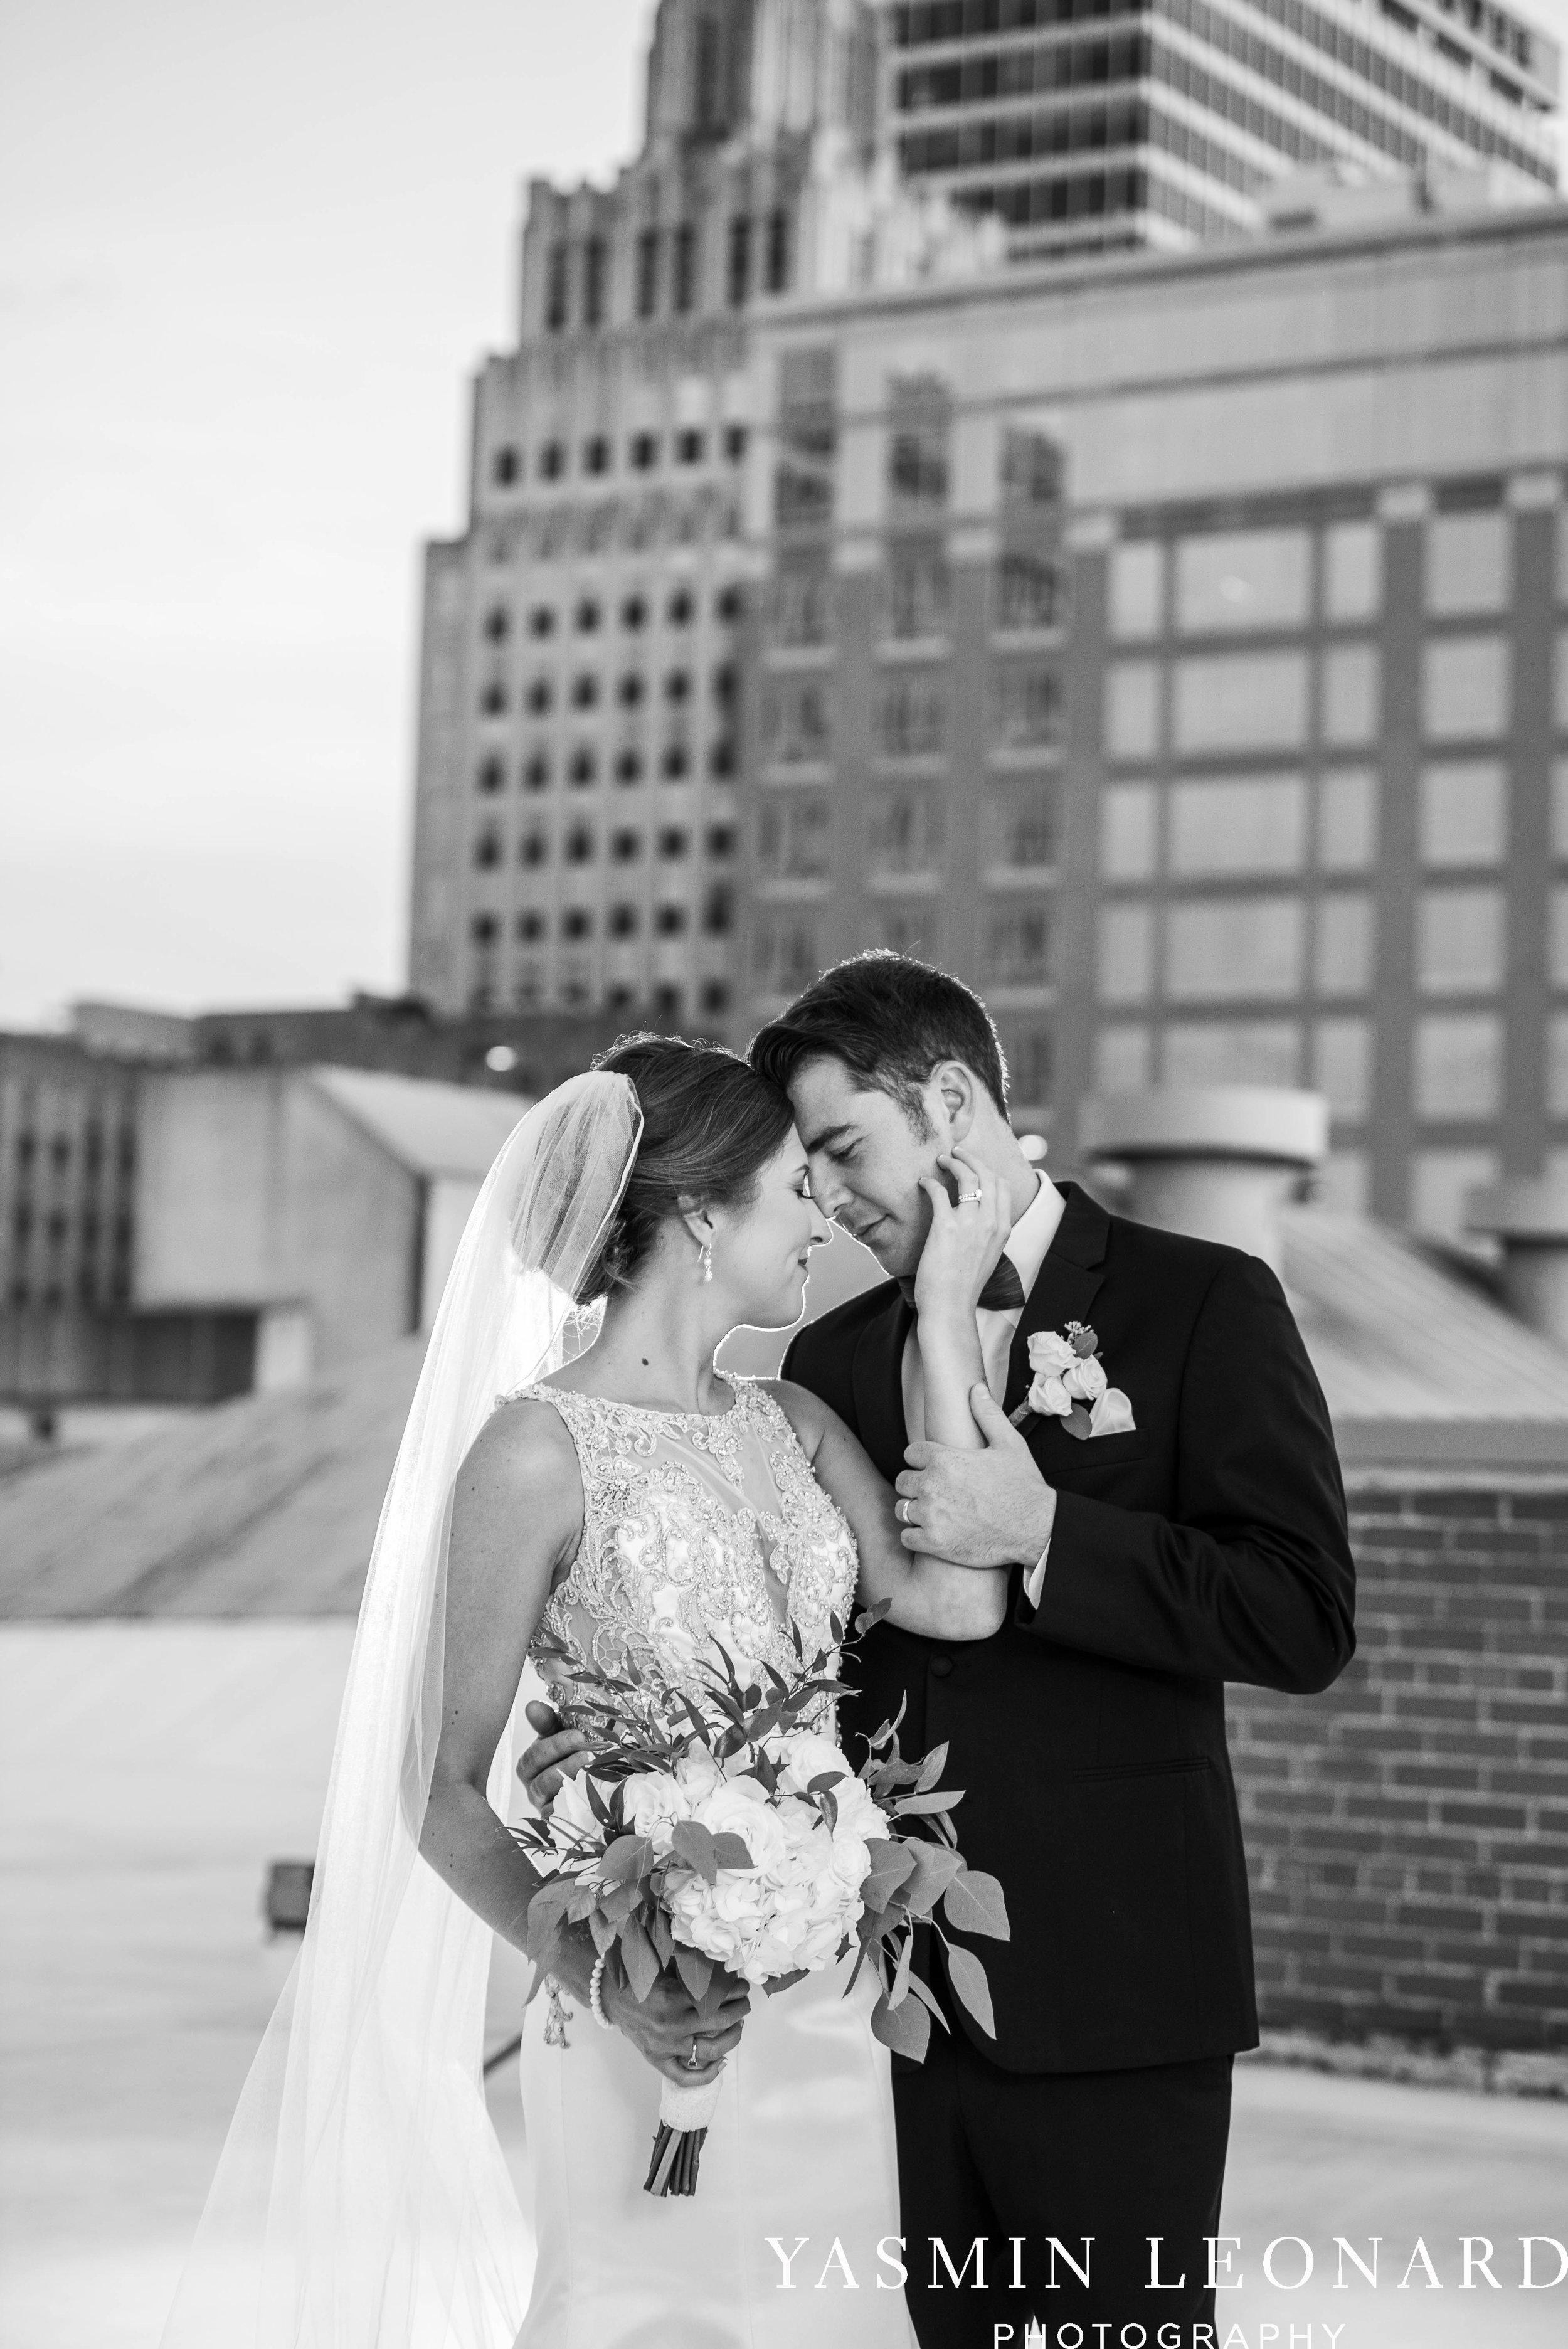 Millennium Center Wedding - Downtown Winston Salem - Winston Salem Wedding Photographer - Winston Salem Venues - Indoor Wedding Venues - NC Wedding Photographer - Yasmin Leonard Photography-53.jpg